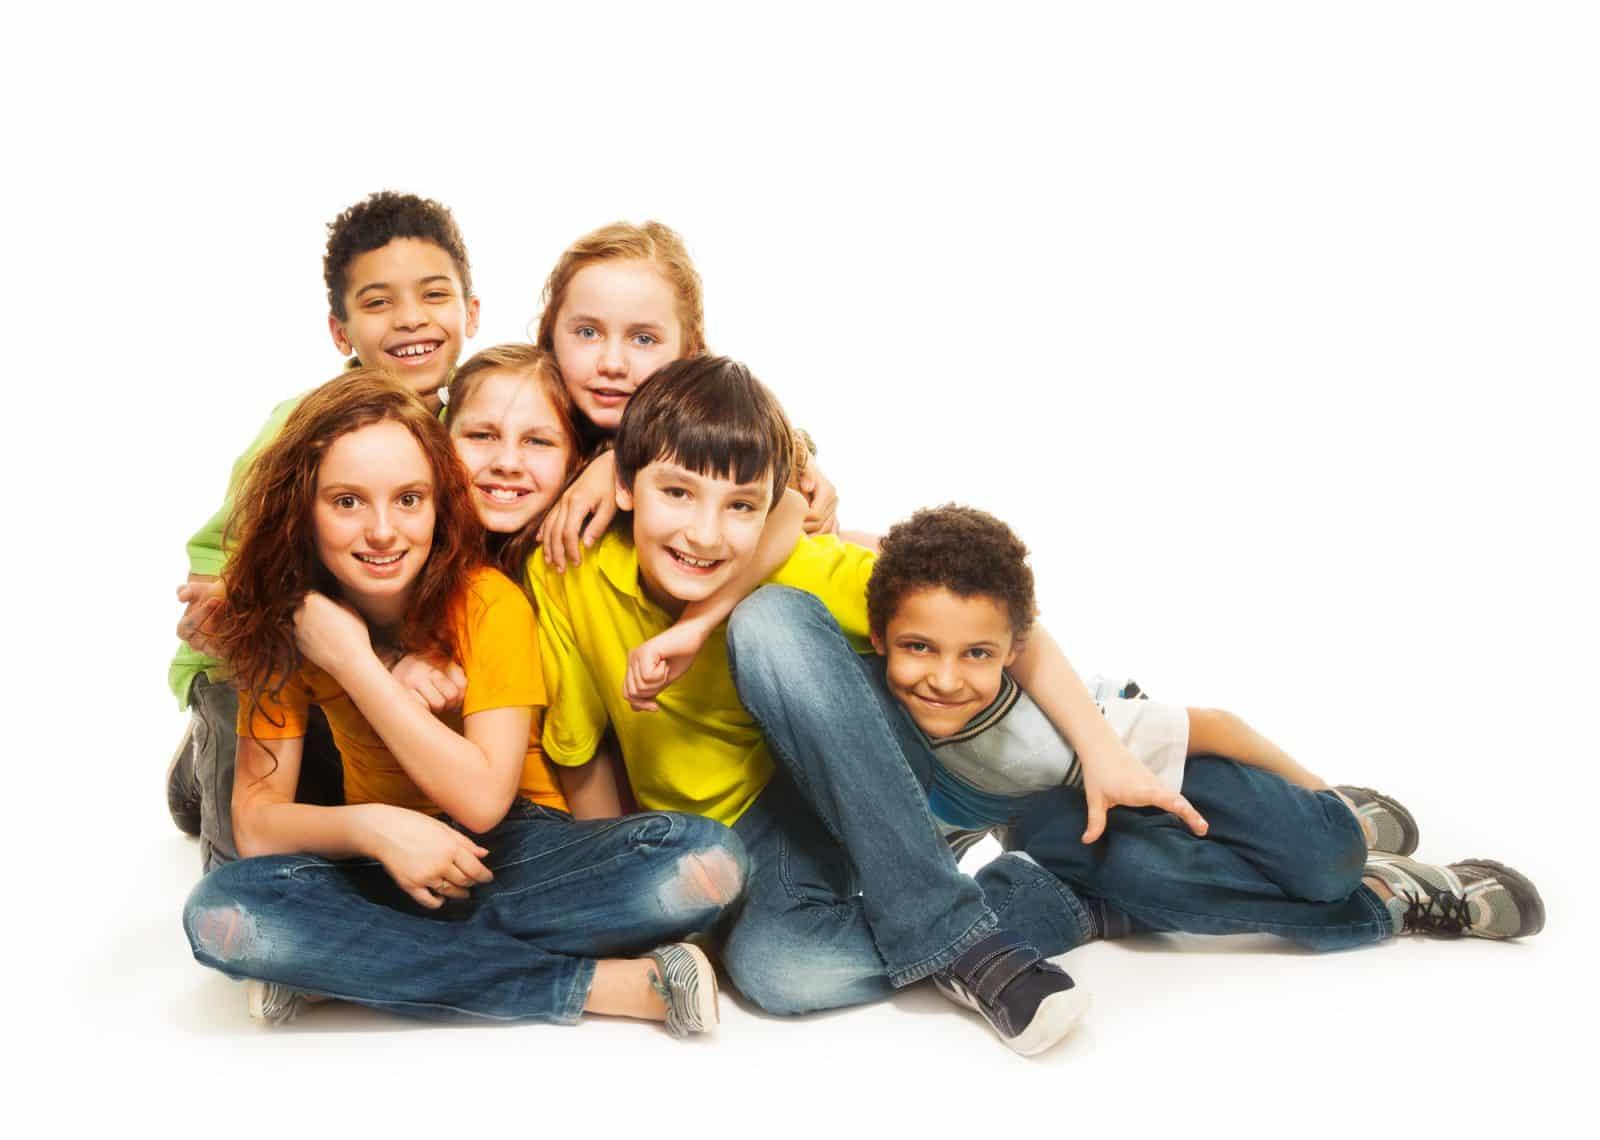 Group of Washington DC area kids